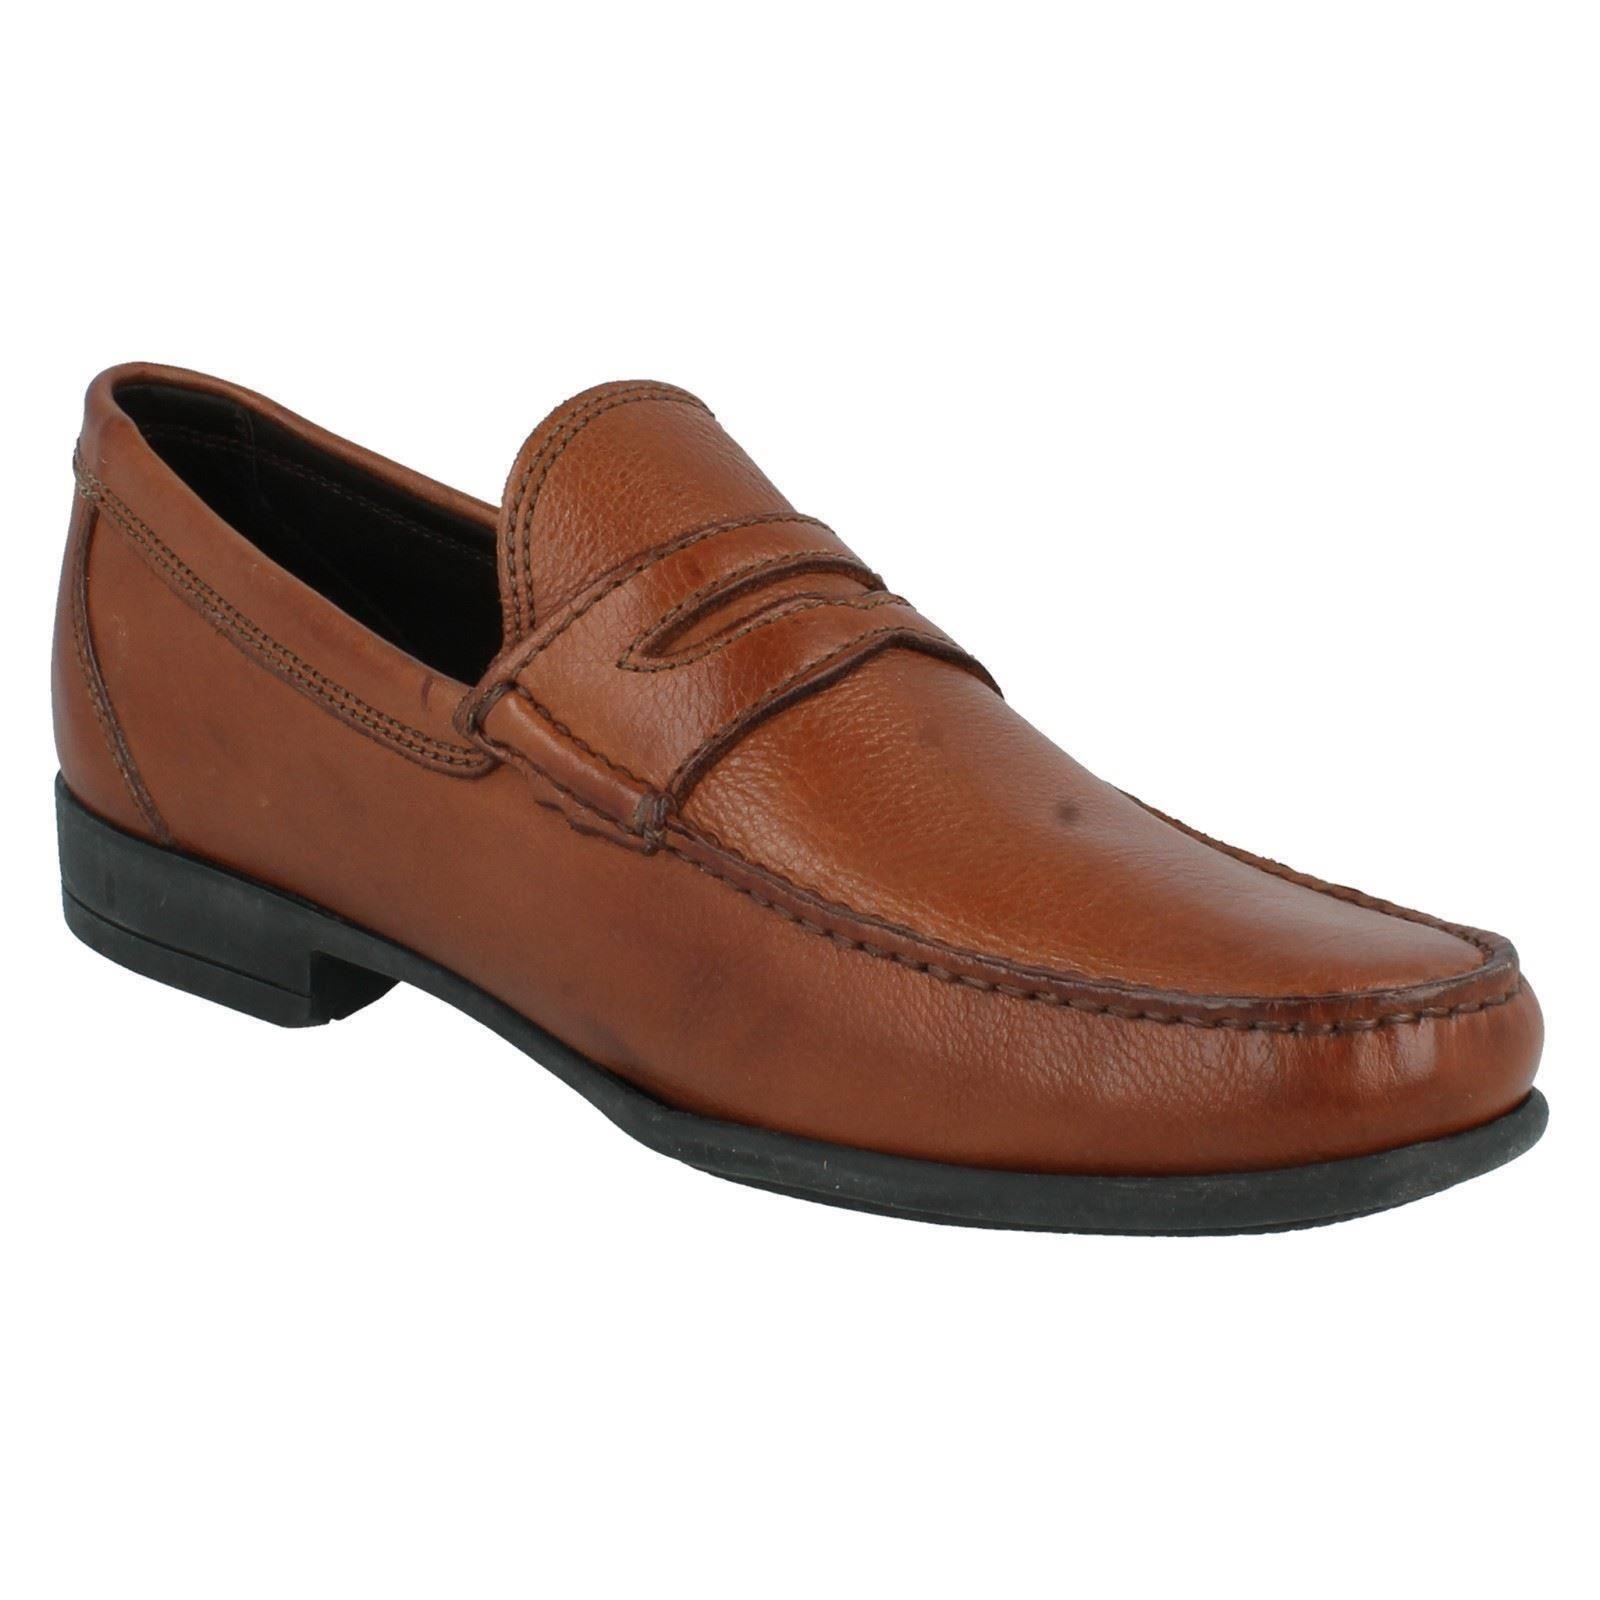 Uomo Anatomic Style & Co Moccasin Loafers Style Anatomic - Castelo 8f889d